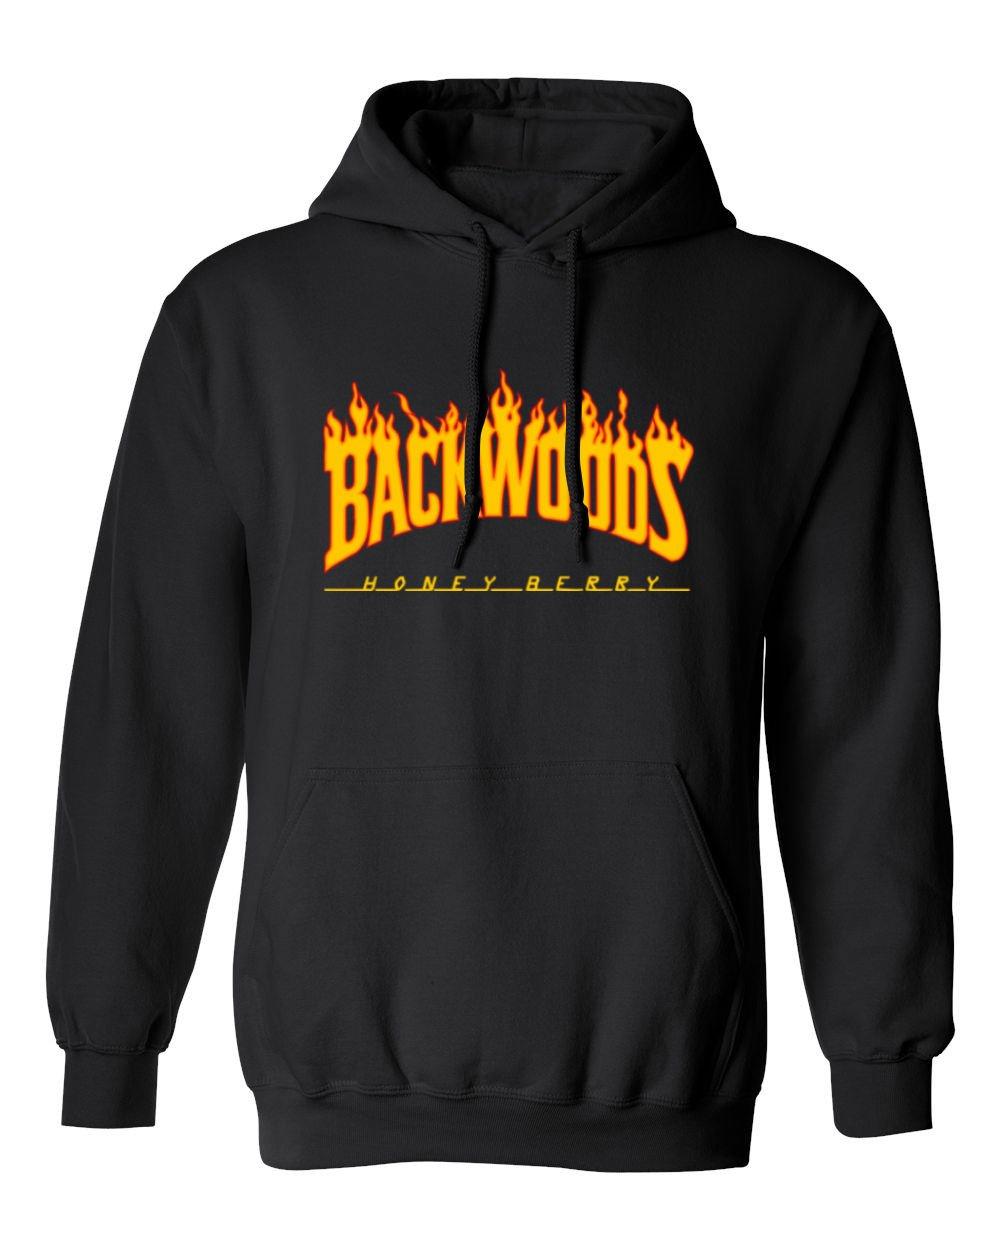 Shirt Flame Backwoods S Hooded